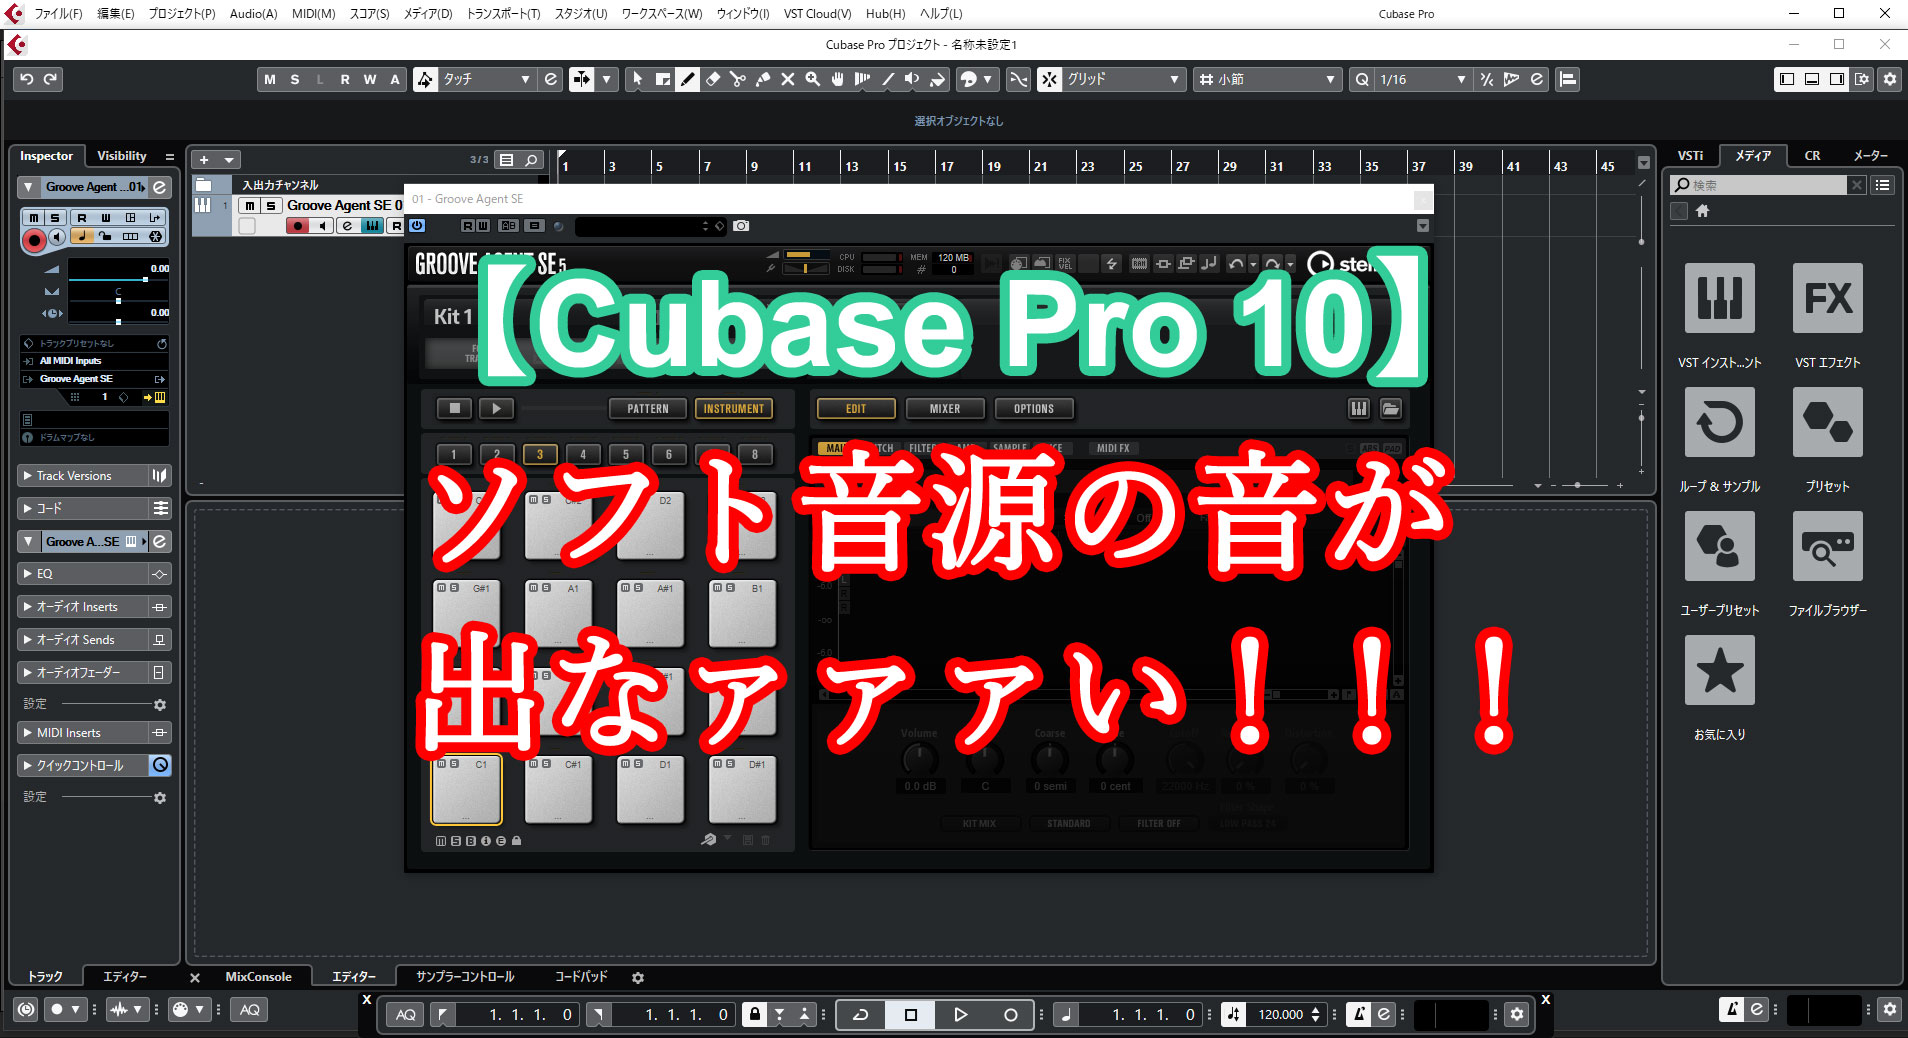 Cubase Pro 10 ソフト音源の音が出なァァァい!!!